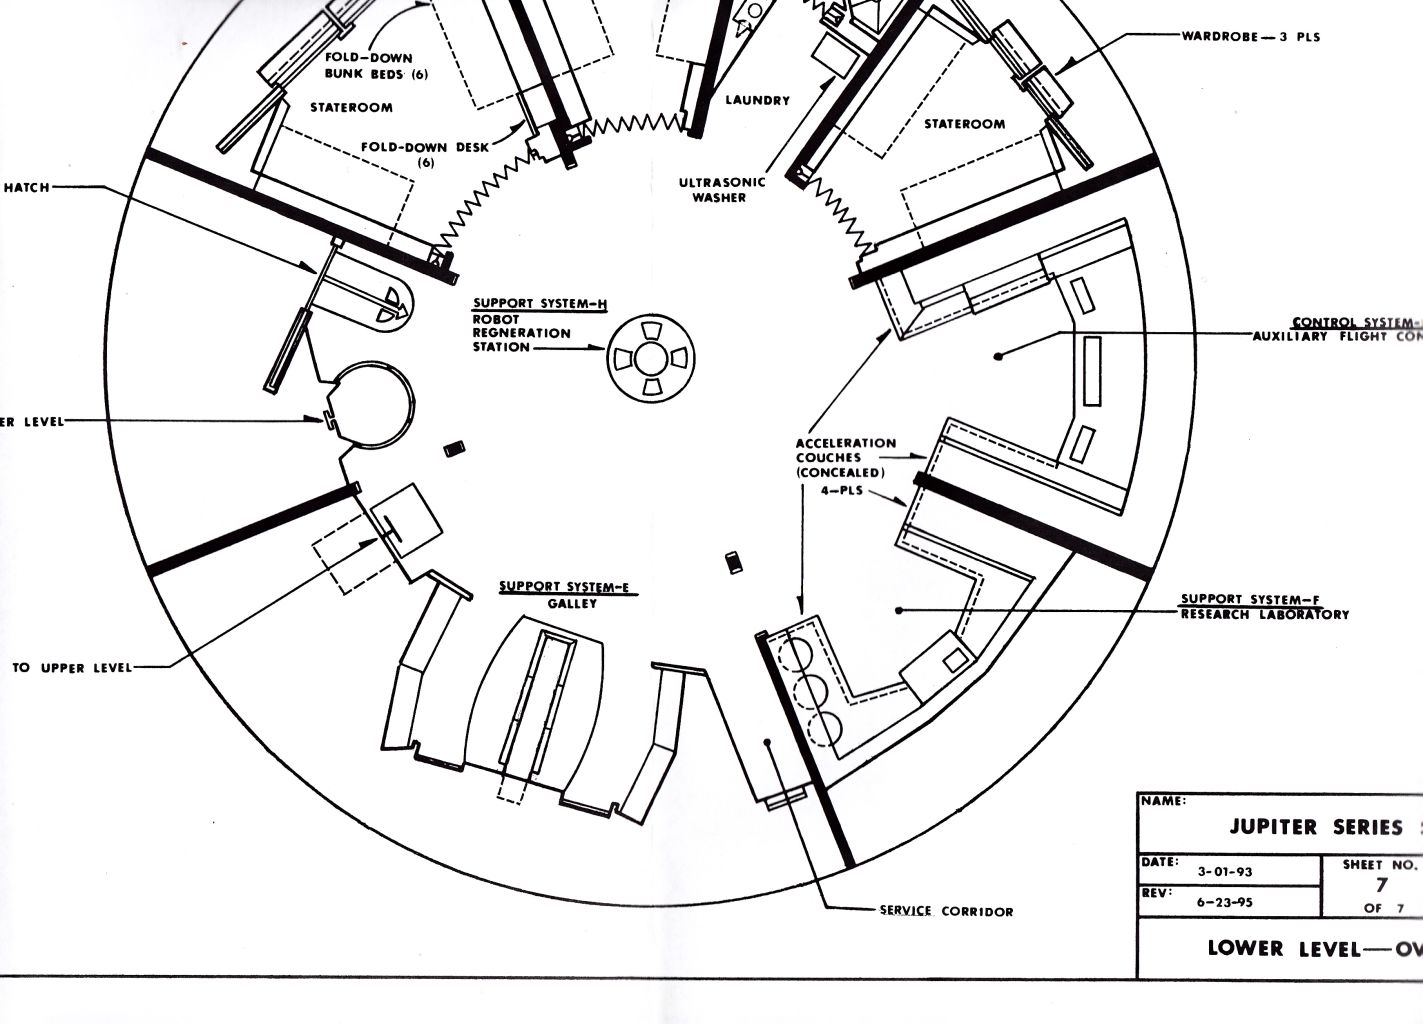 jupiter 2 blueprints and diagrams